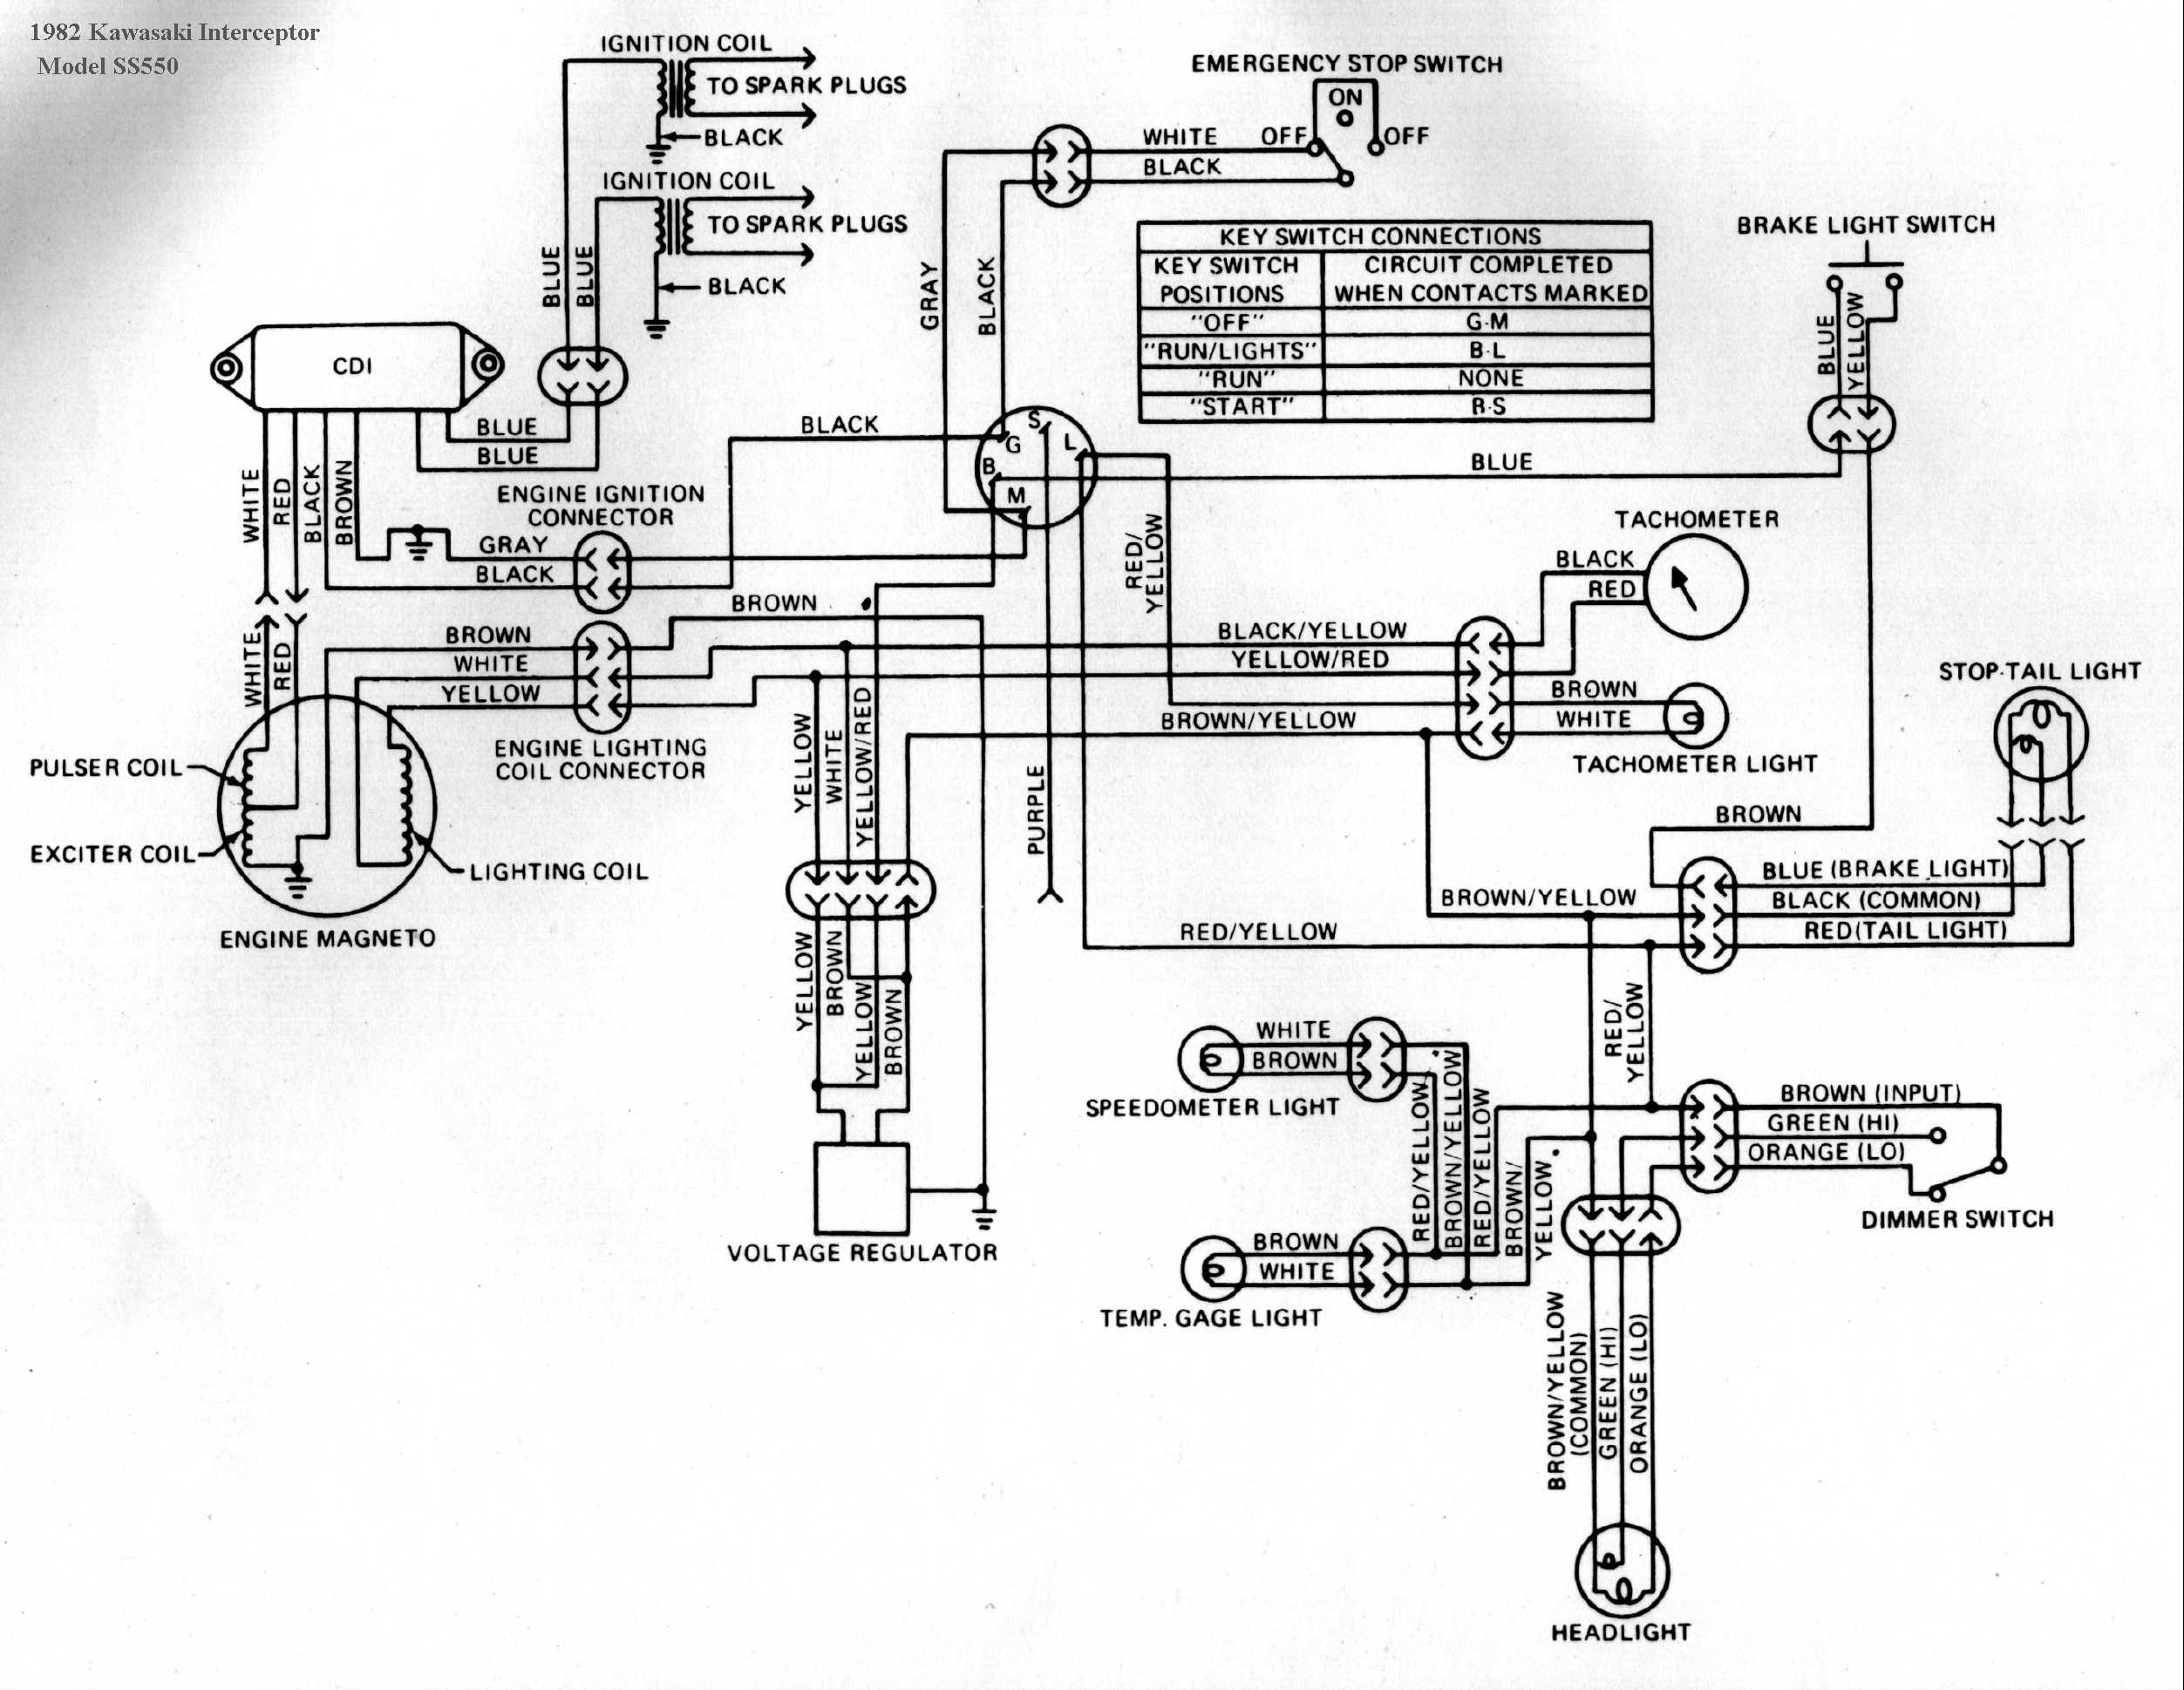 06 ski doo wire diagram wiring library 02 ski-doo wiring harness diagram  2006 ski